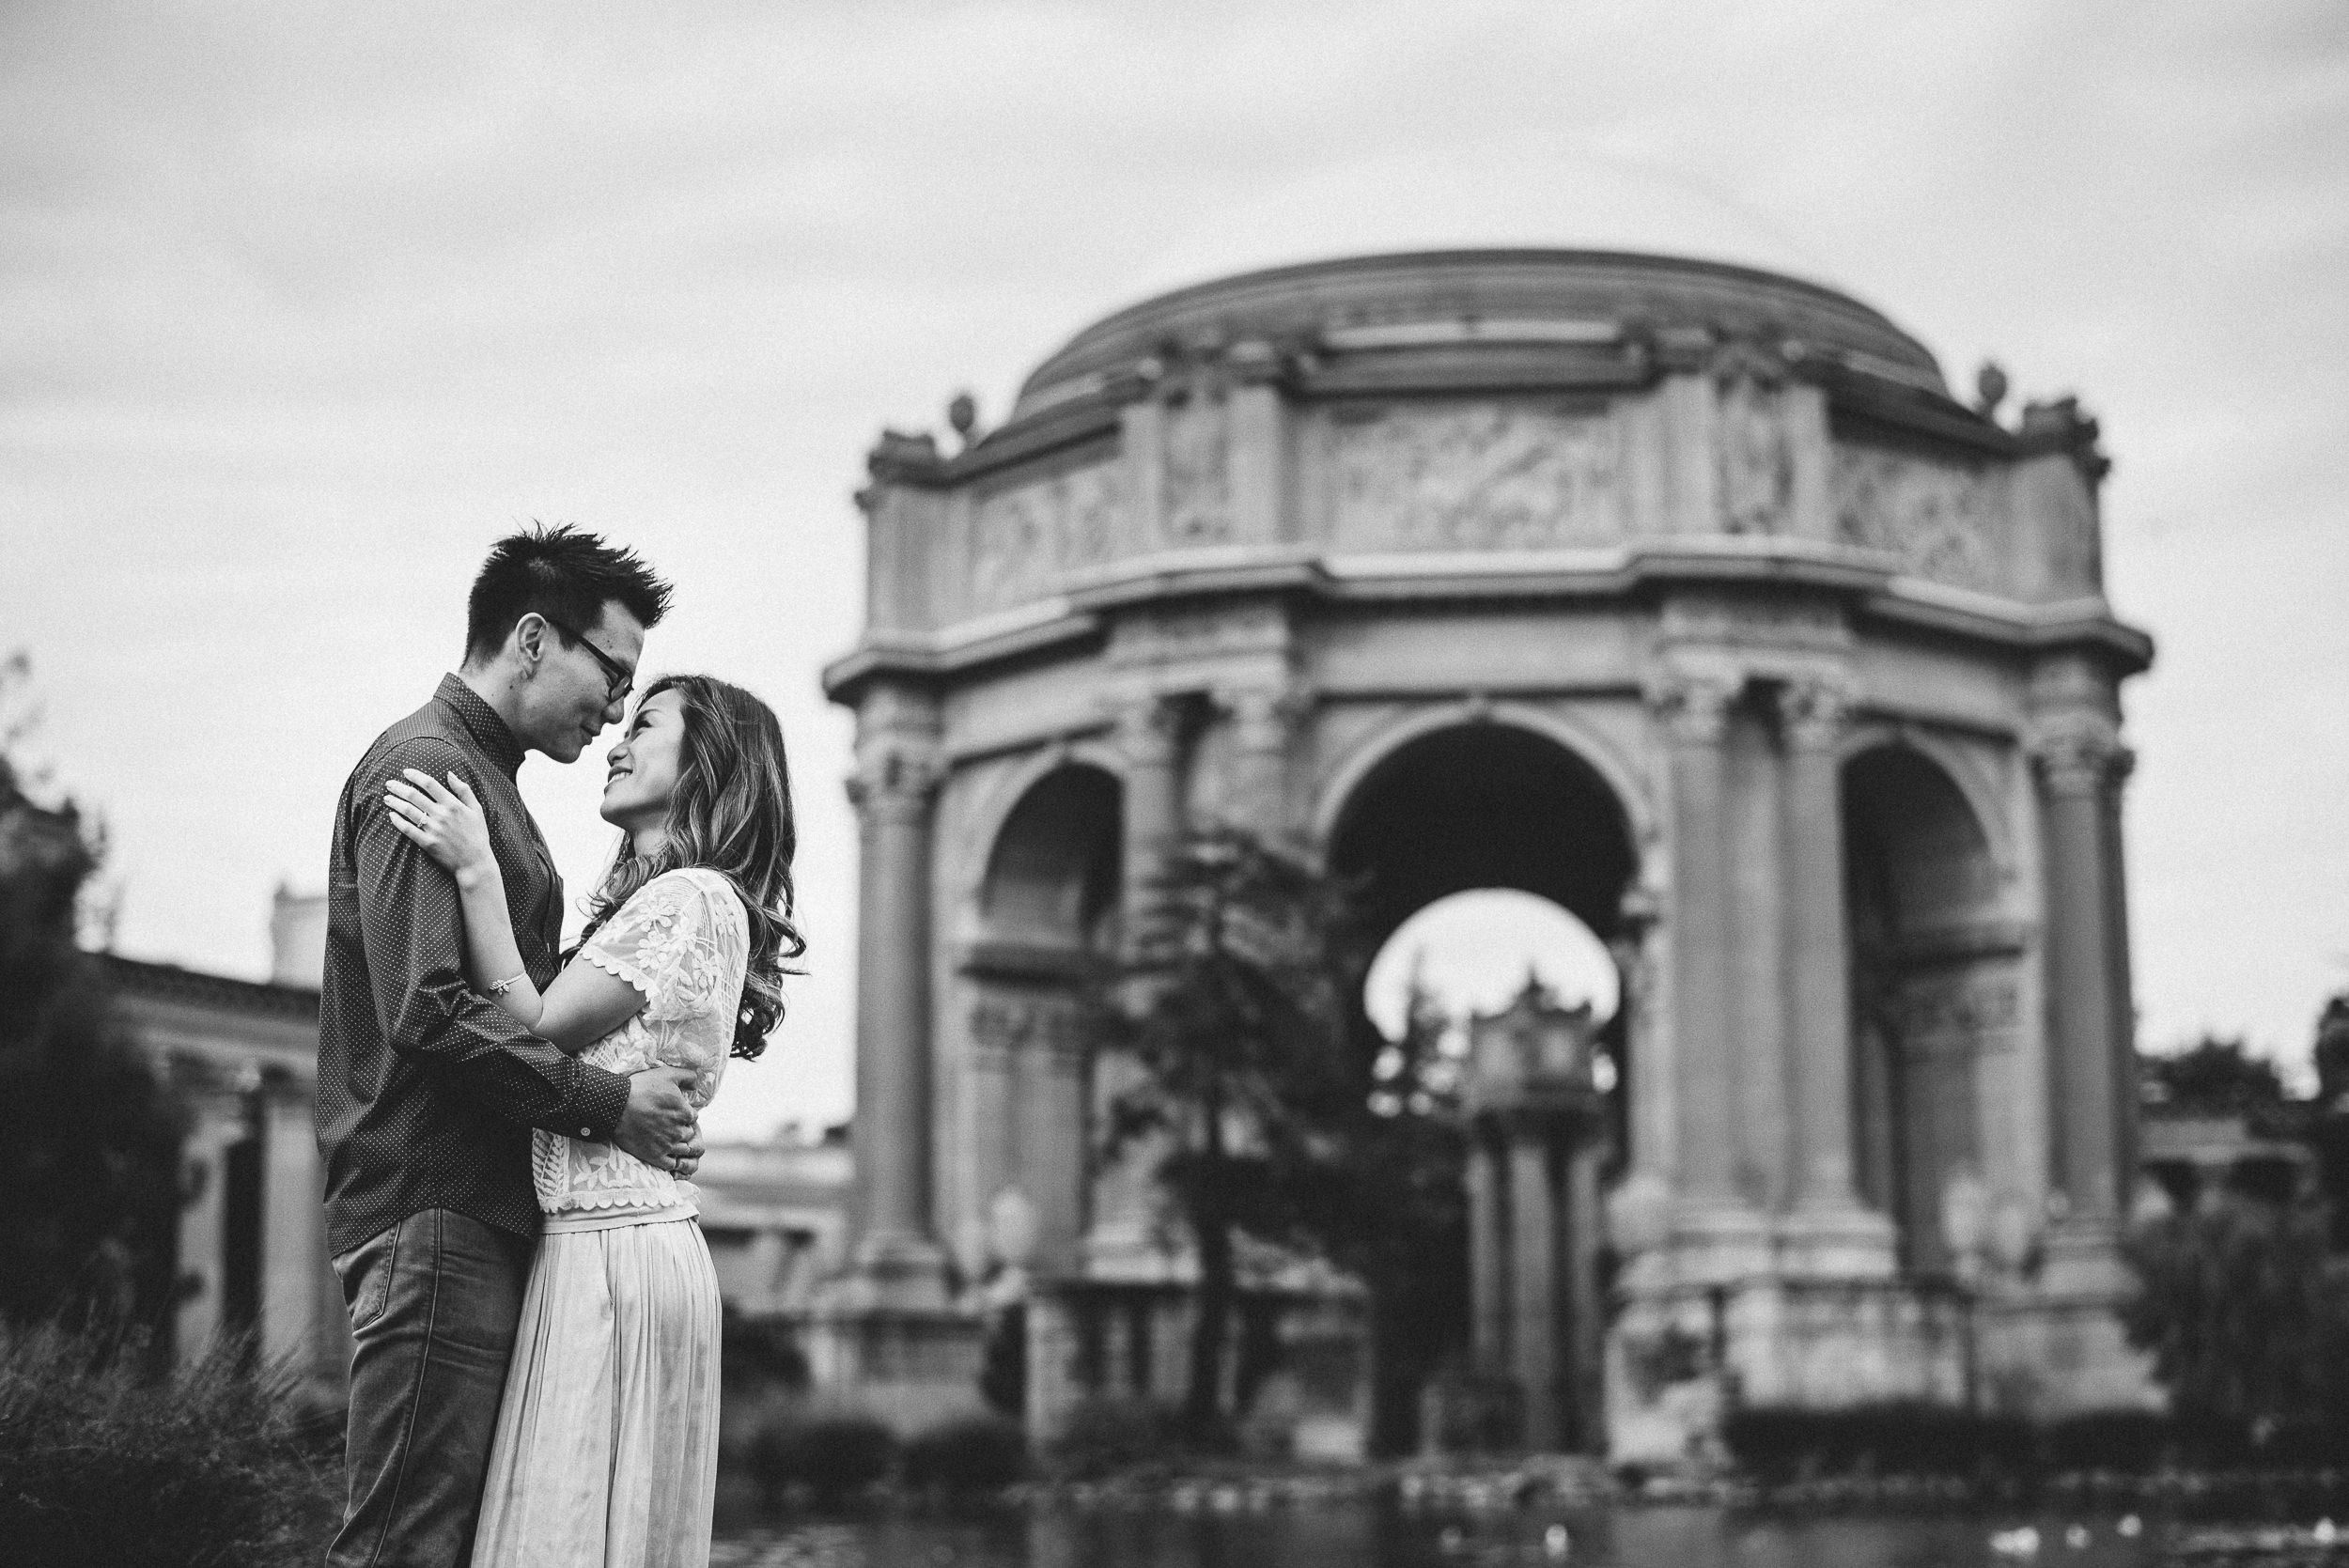 Palace-of-Fine-Arts-San-Francisco-Engagement-Photography-008.jpg